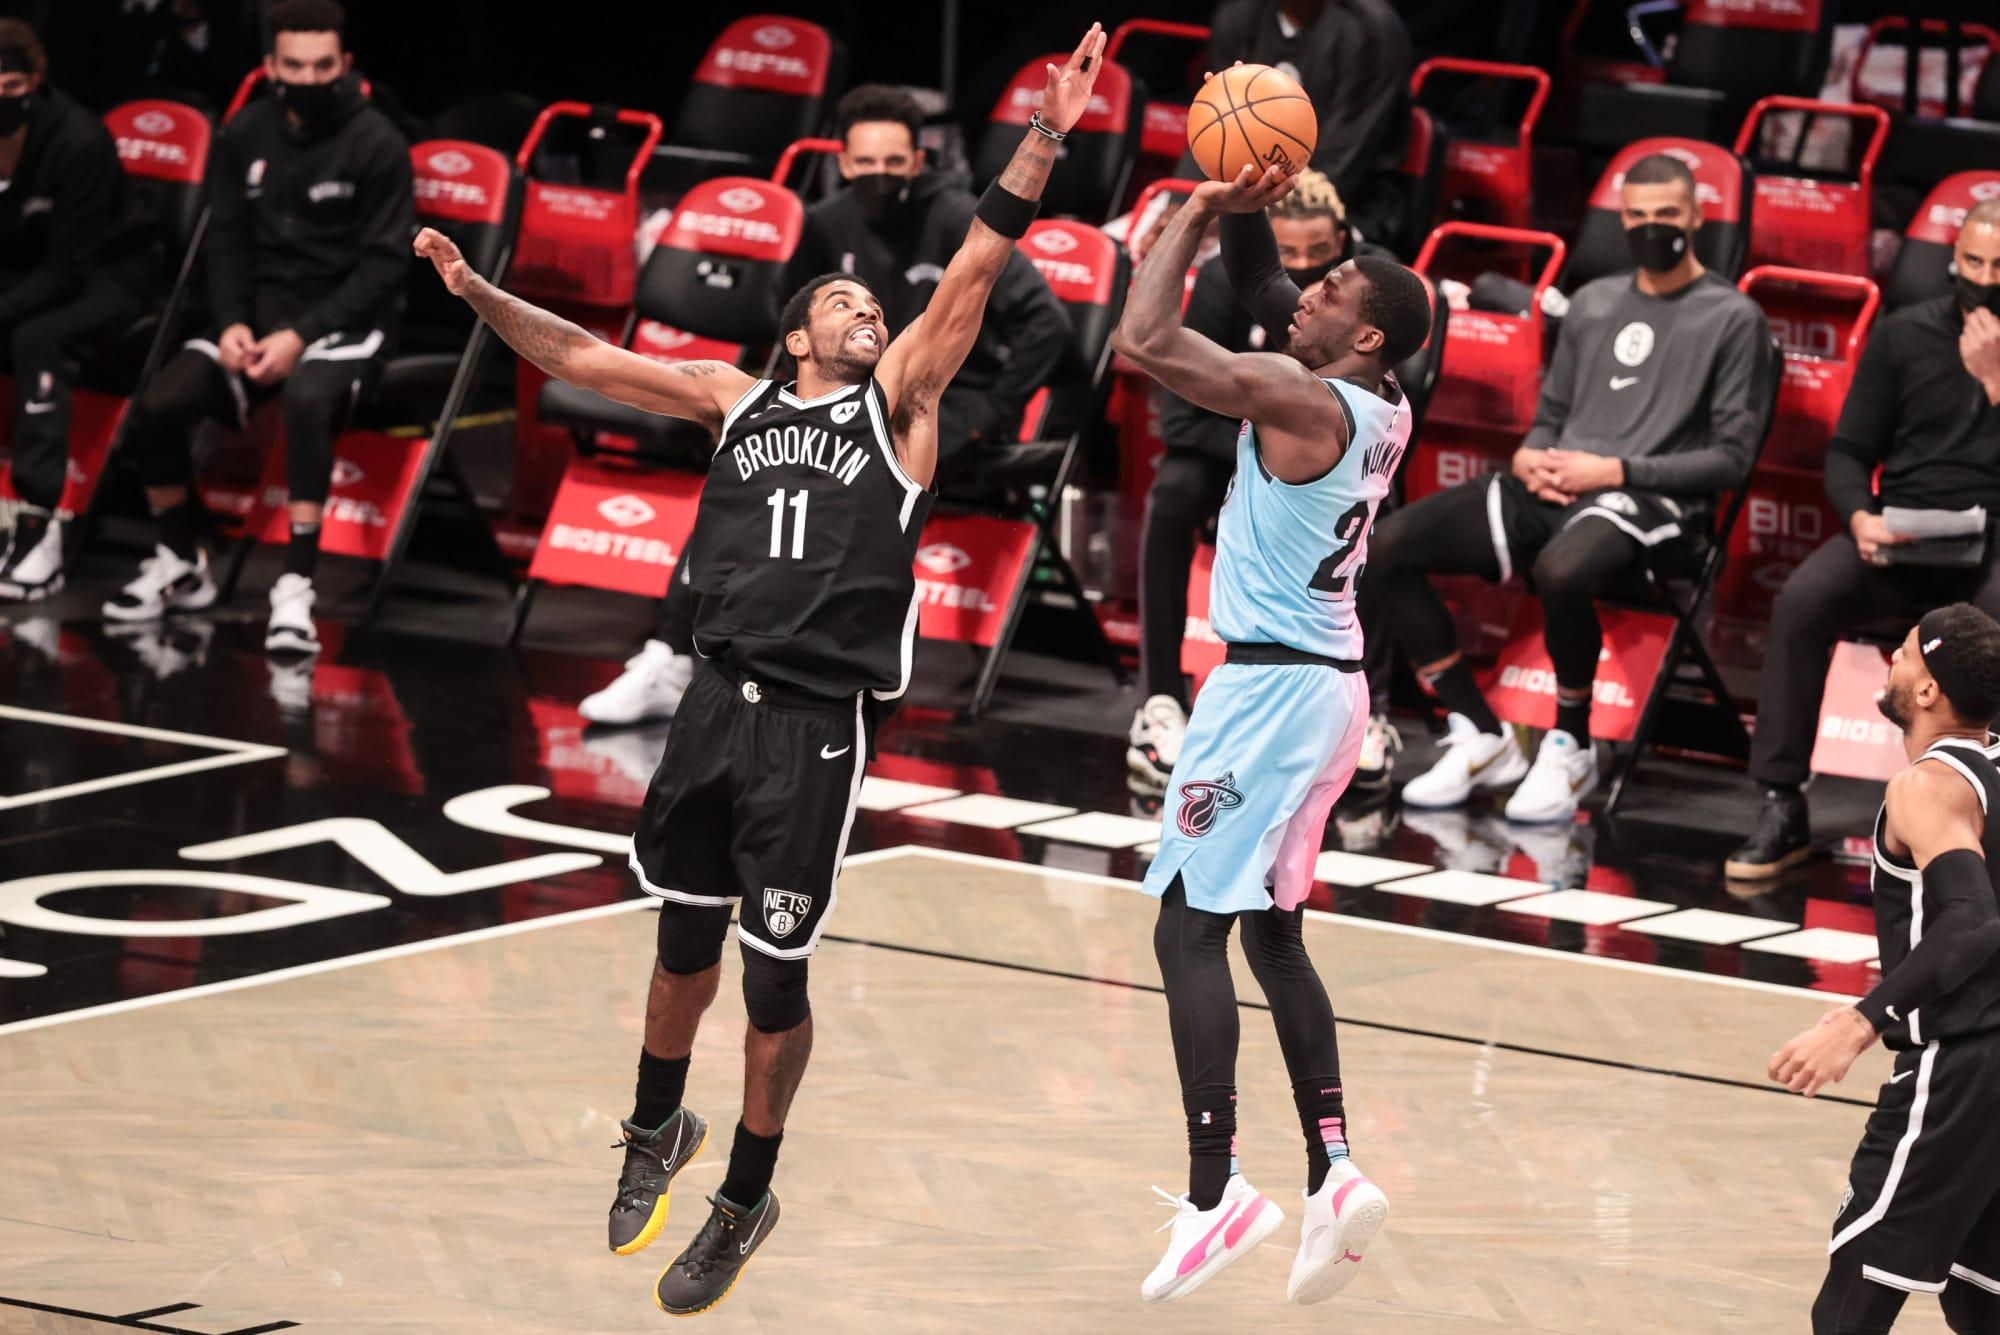 Miami Heat: Kendrick Nunn is having a resurgence amid team struggles